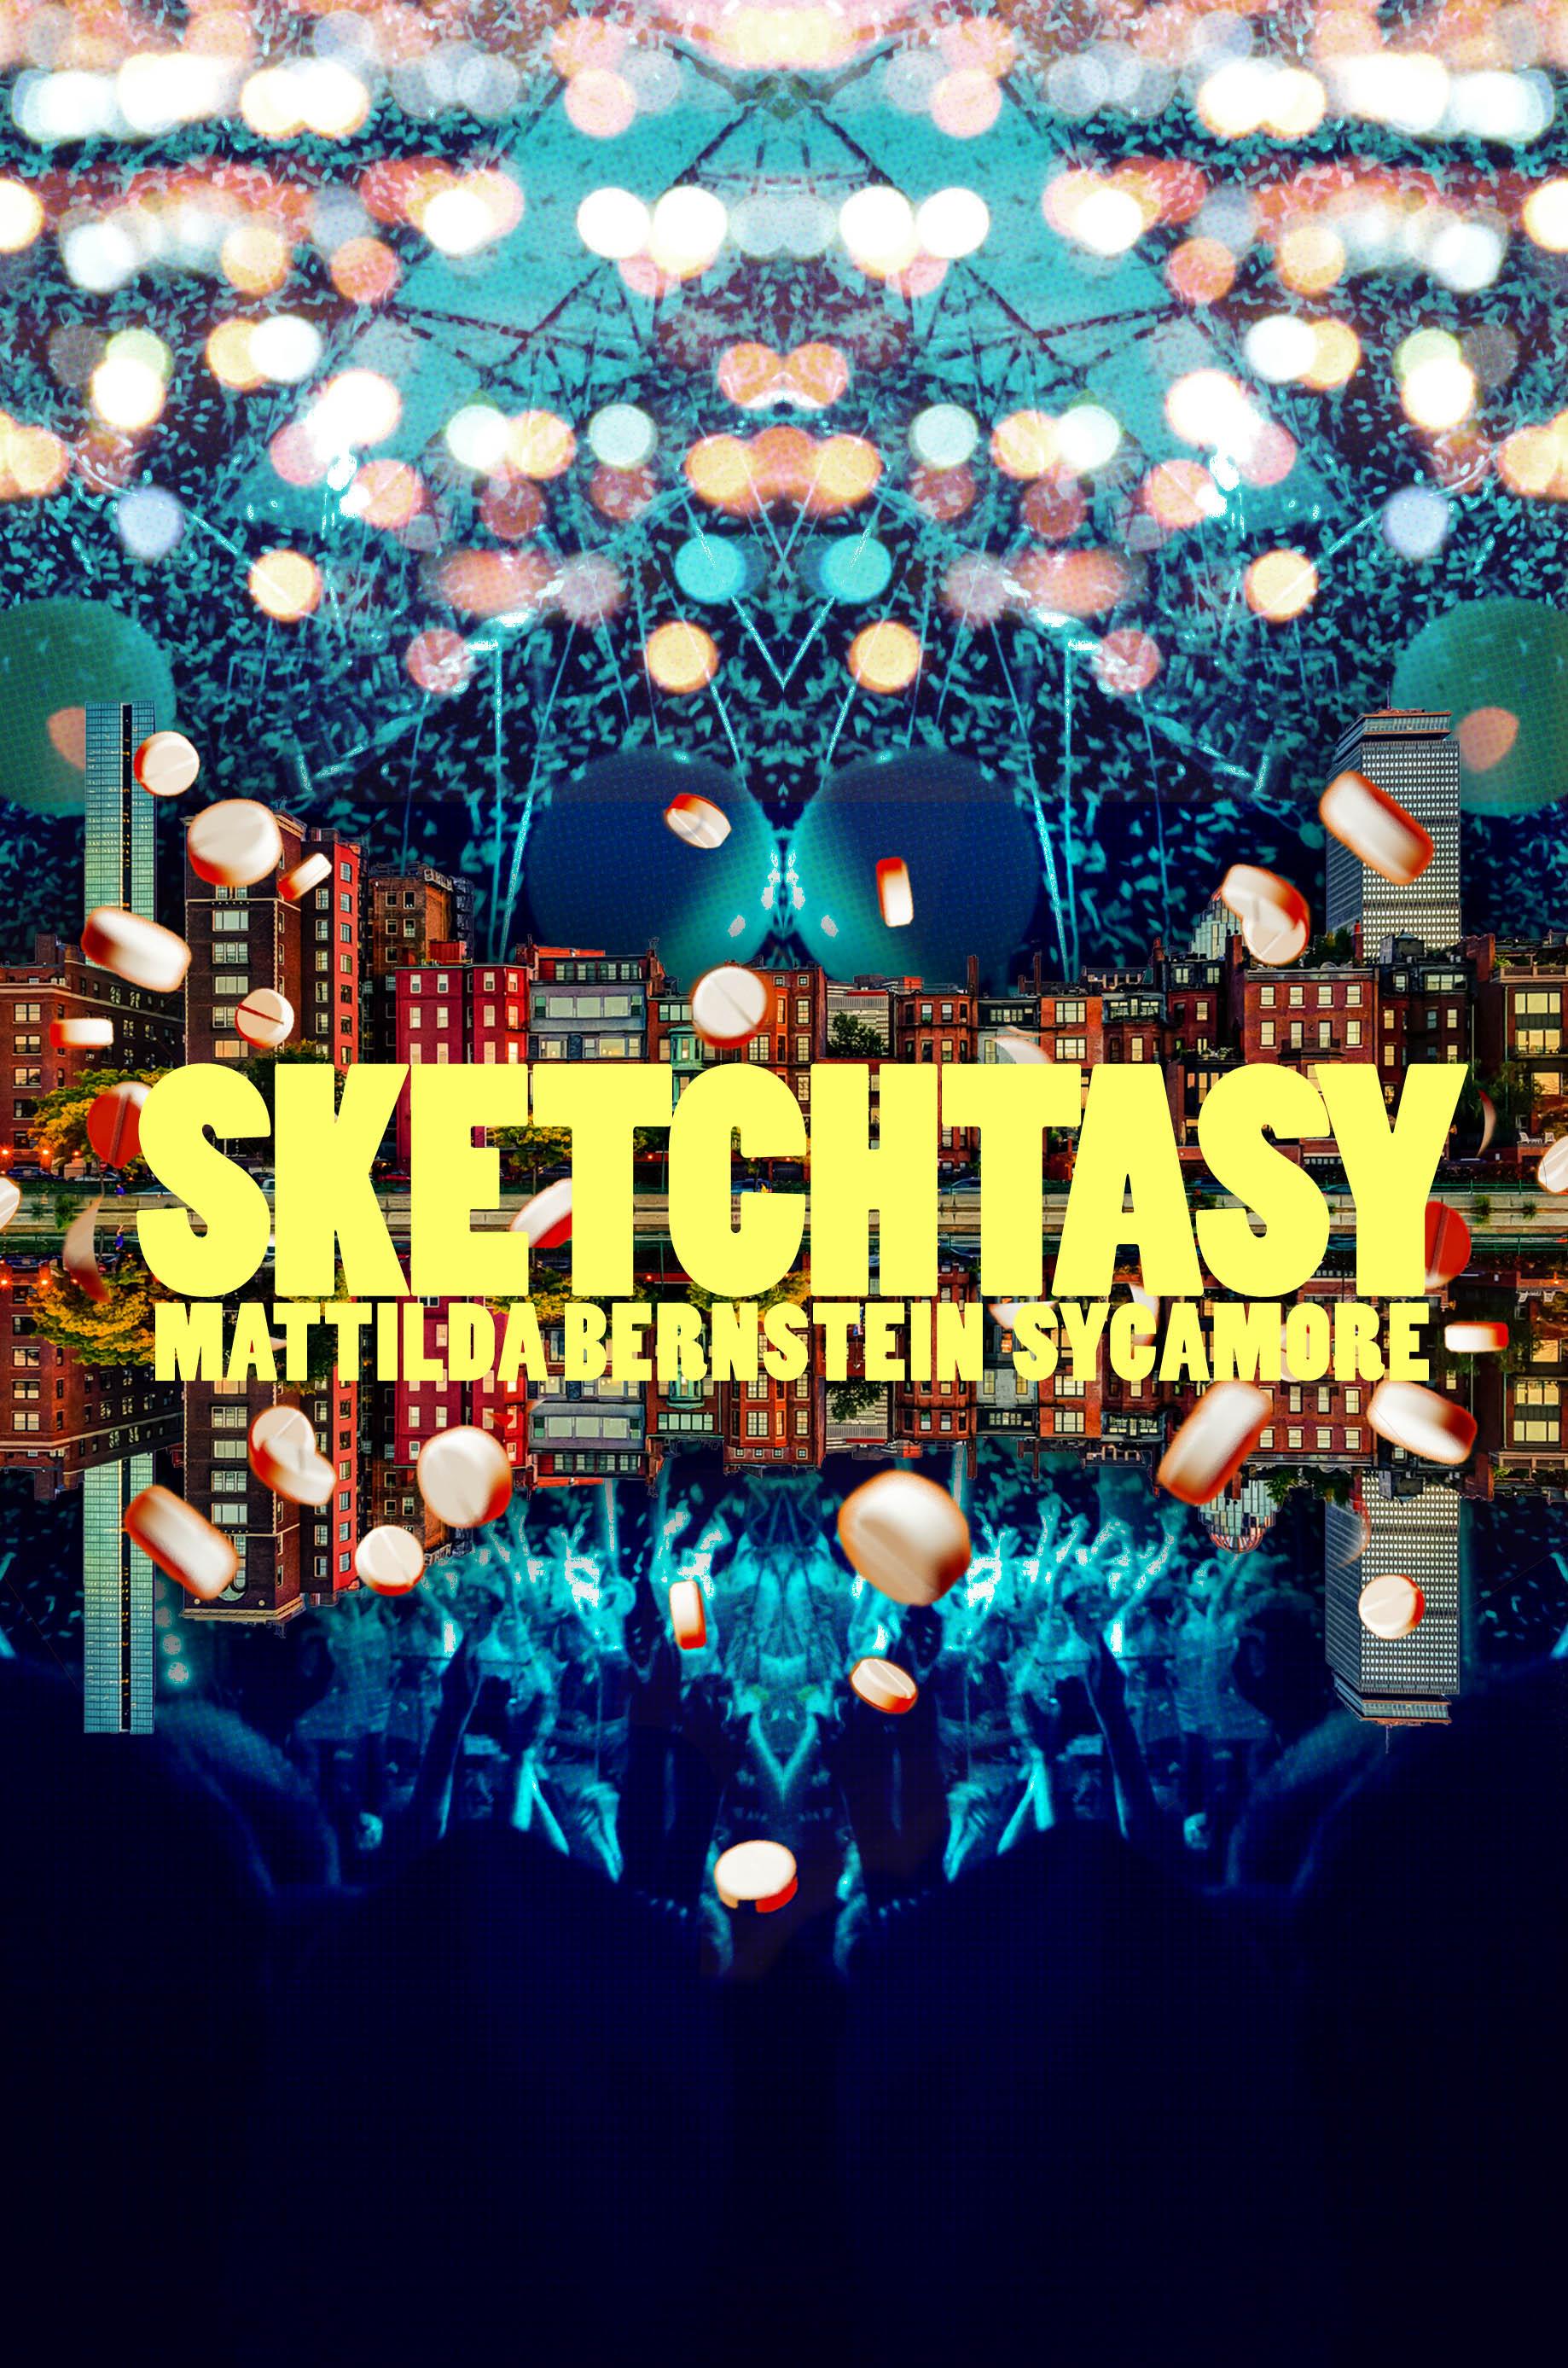 Sketchtasy cover.jpg